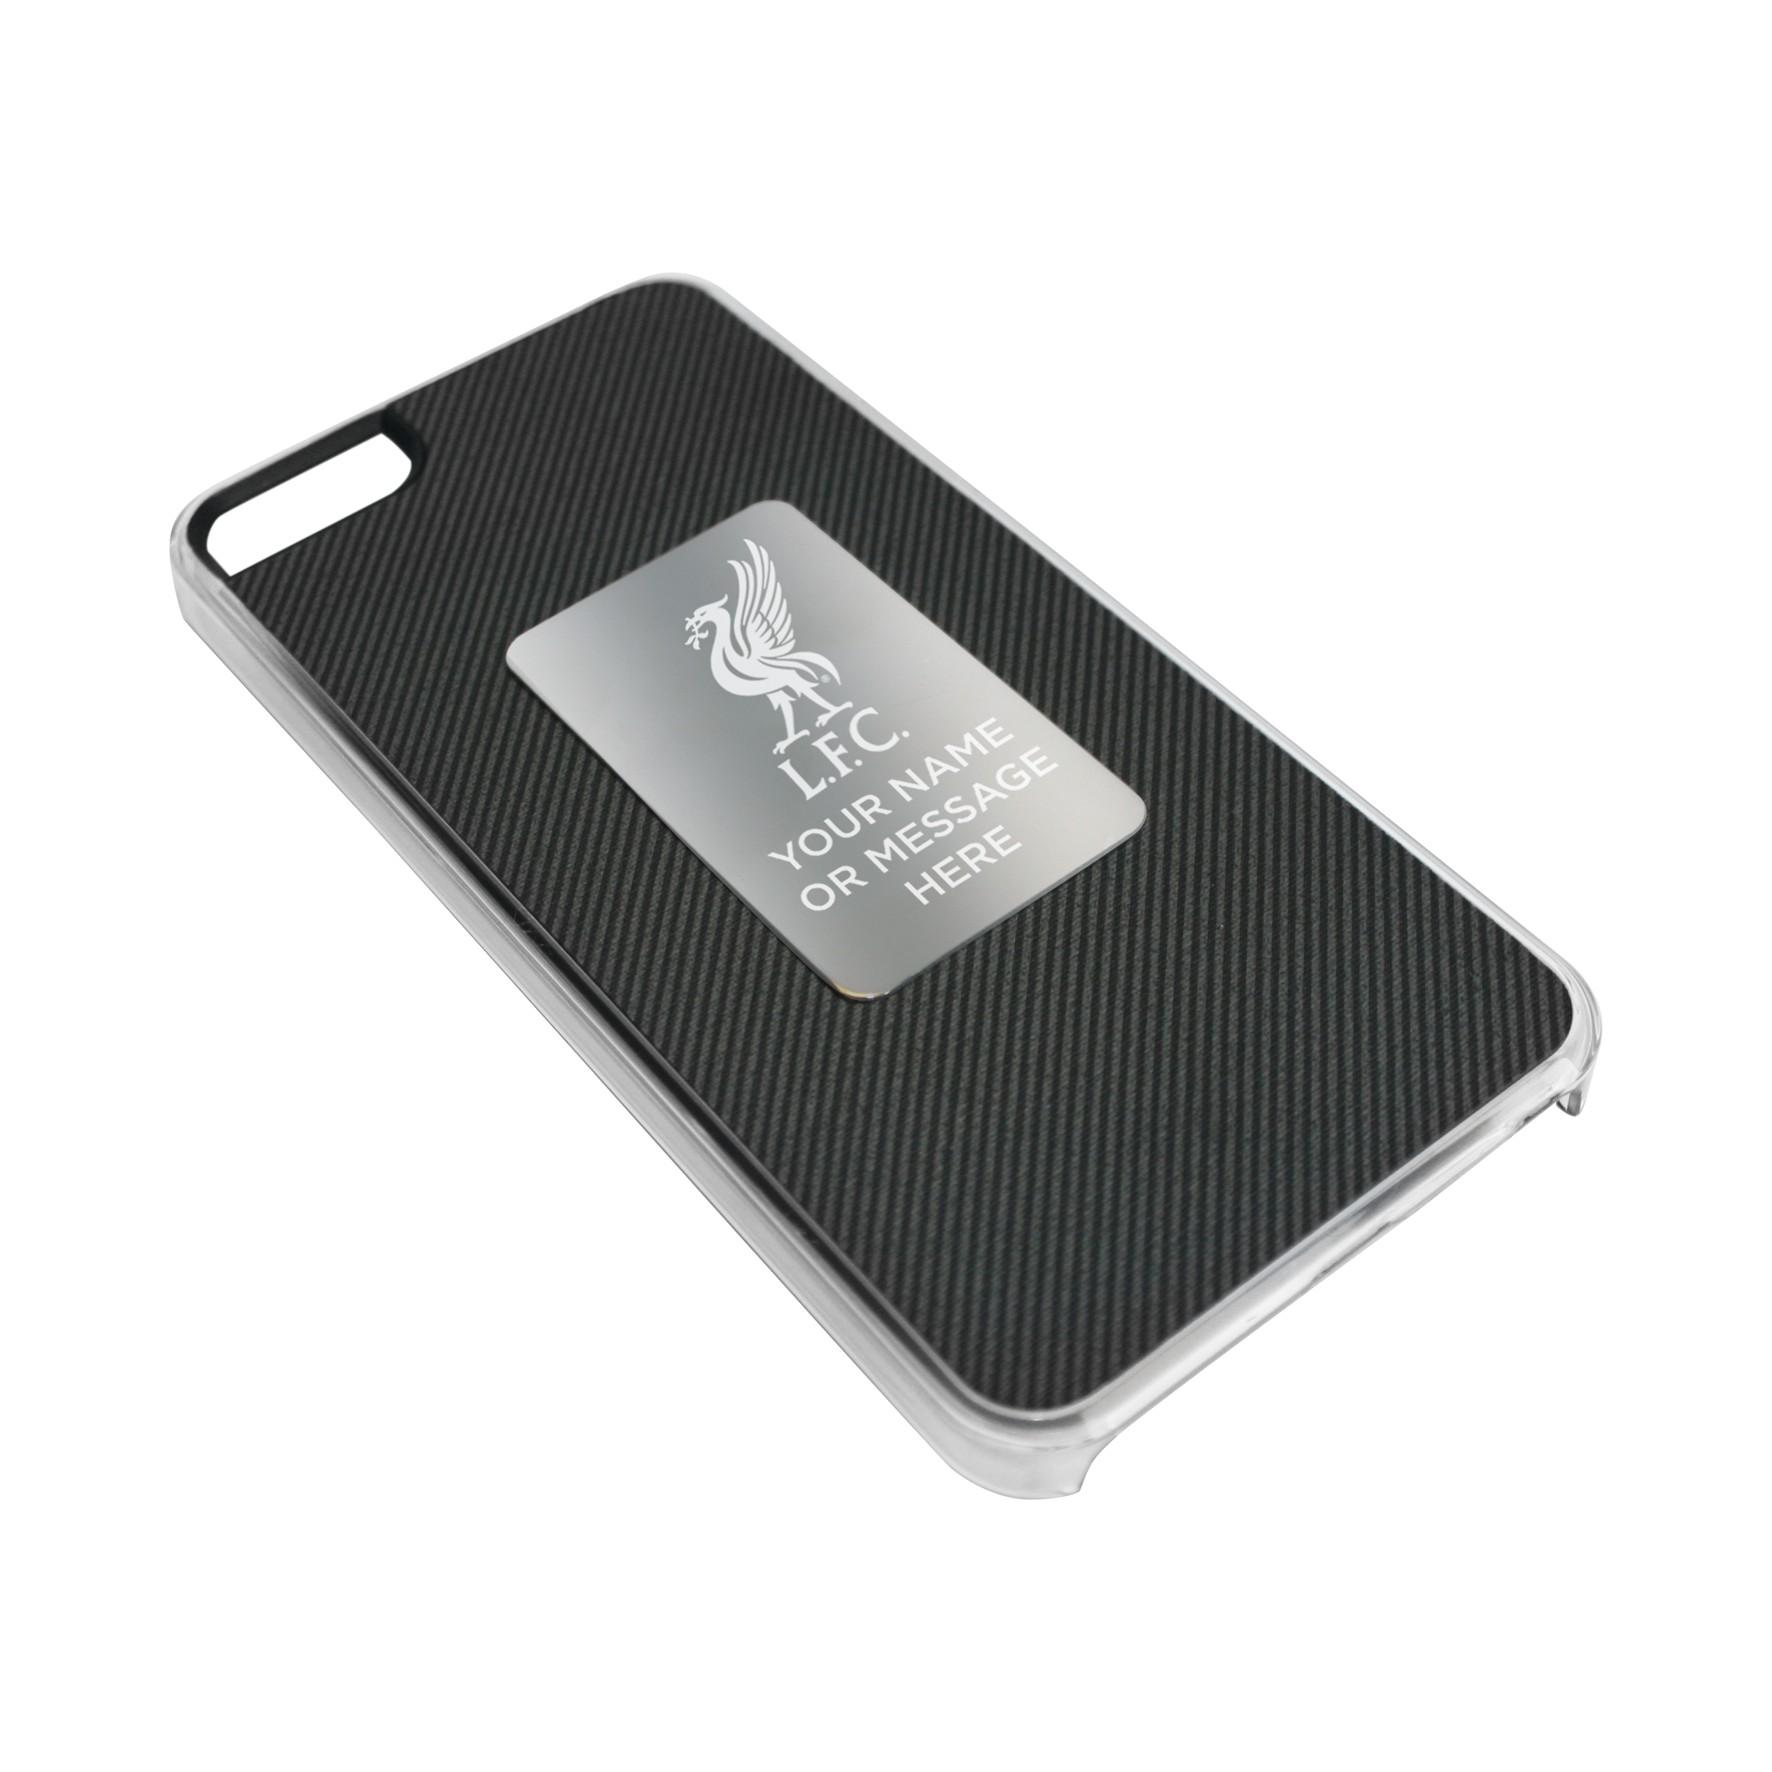 Liverpool Phone Case Iphone S